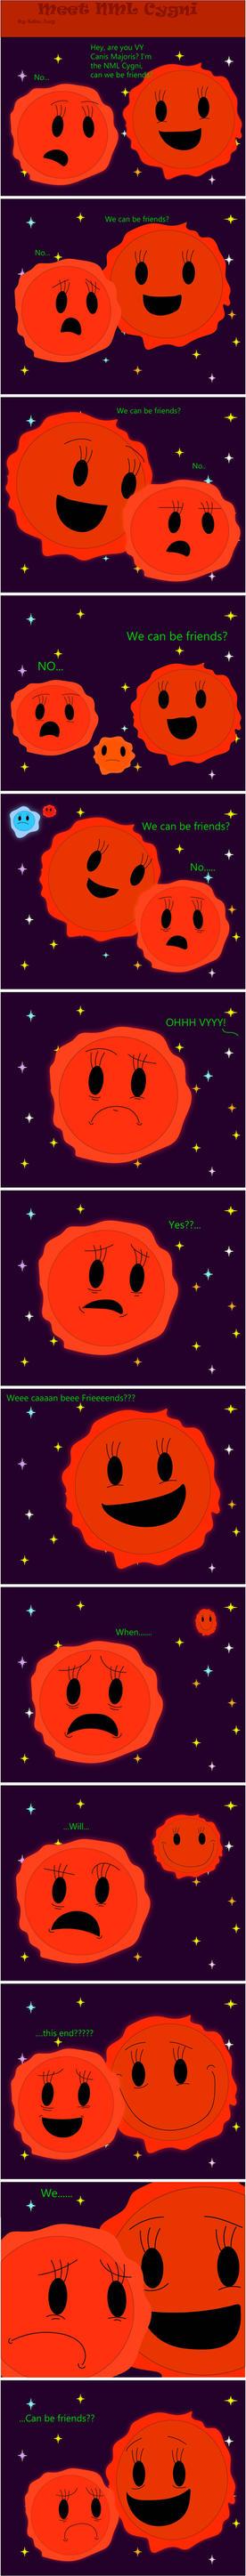 Astronomical Comics: ep 4 by Edu1806031122